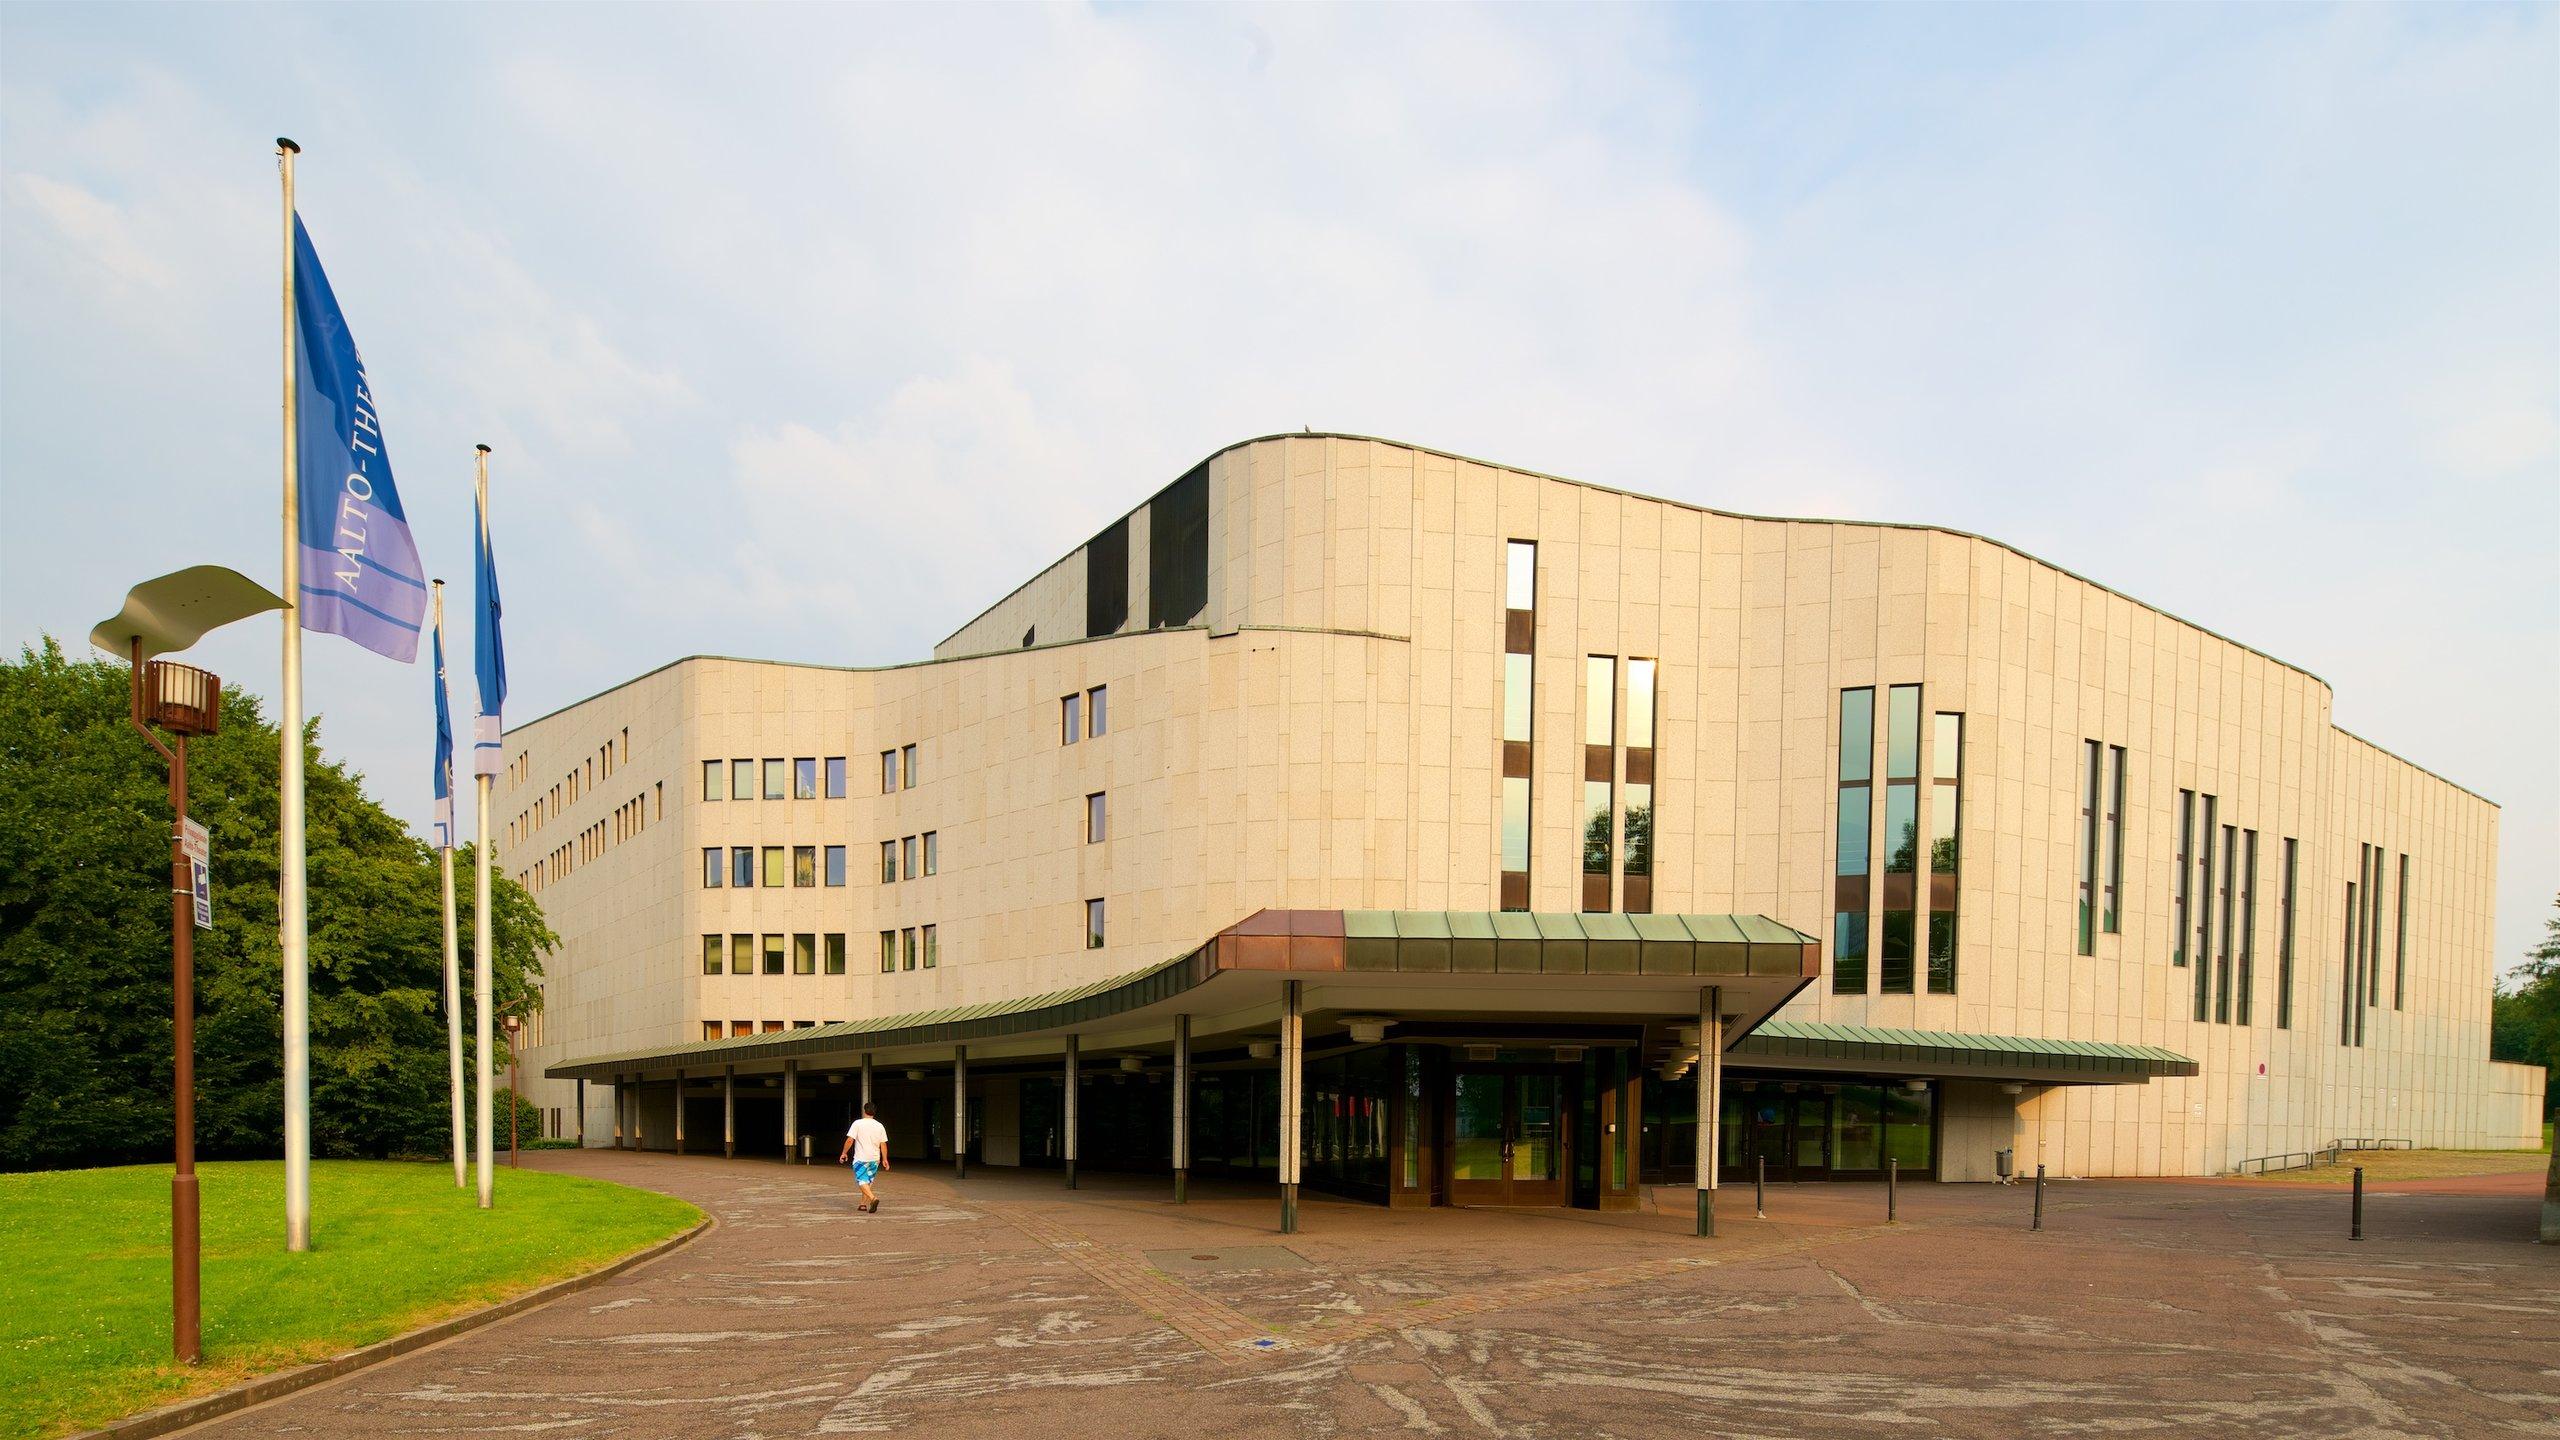 Suedviertel, Essen, North Rhine-Westphalia, Germany